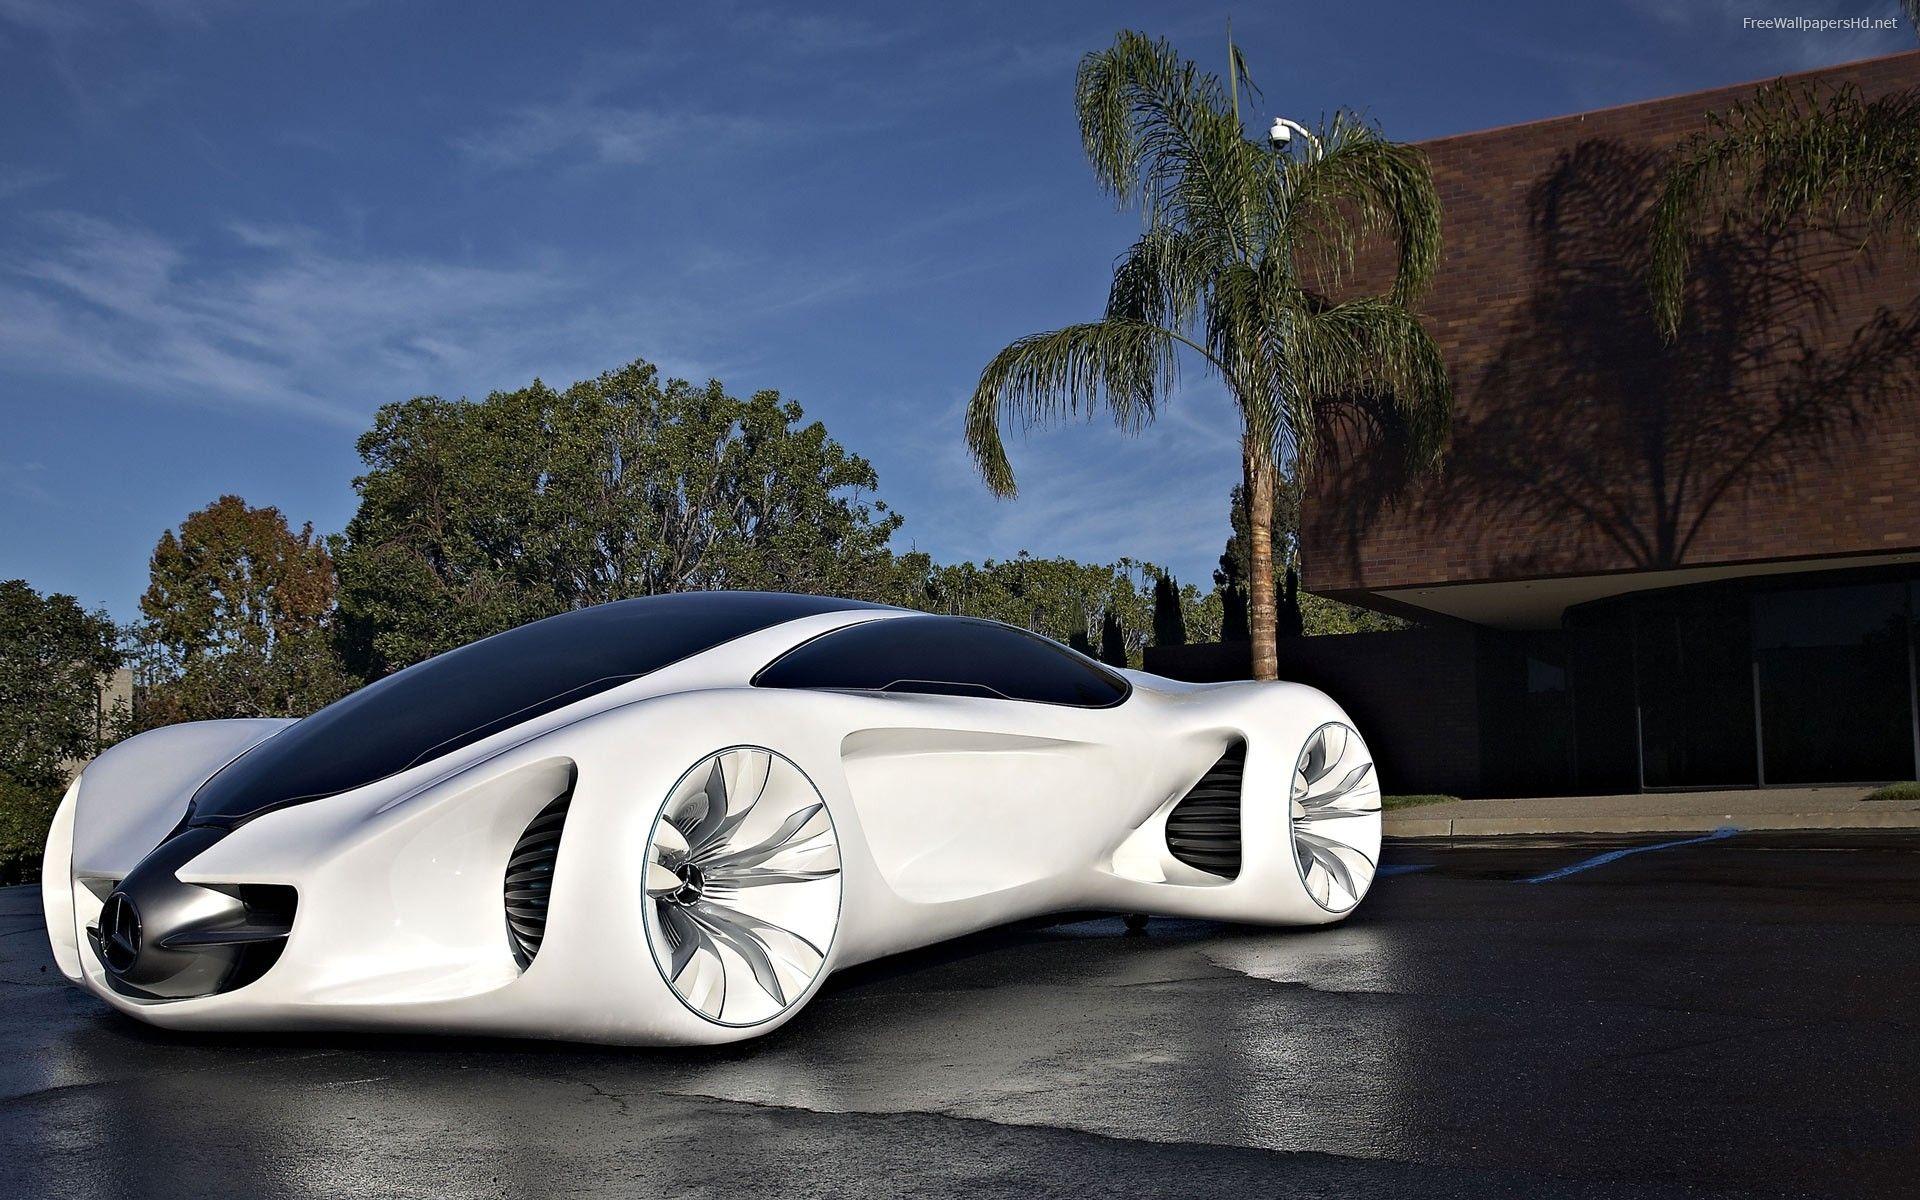 future automobiles   Future Cars Widescreen Free Hd New Year